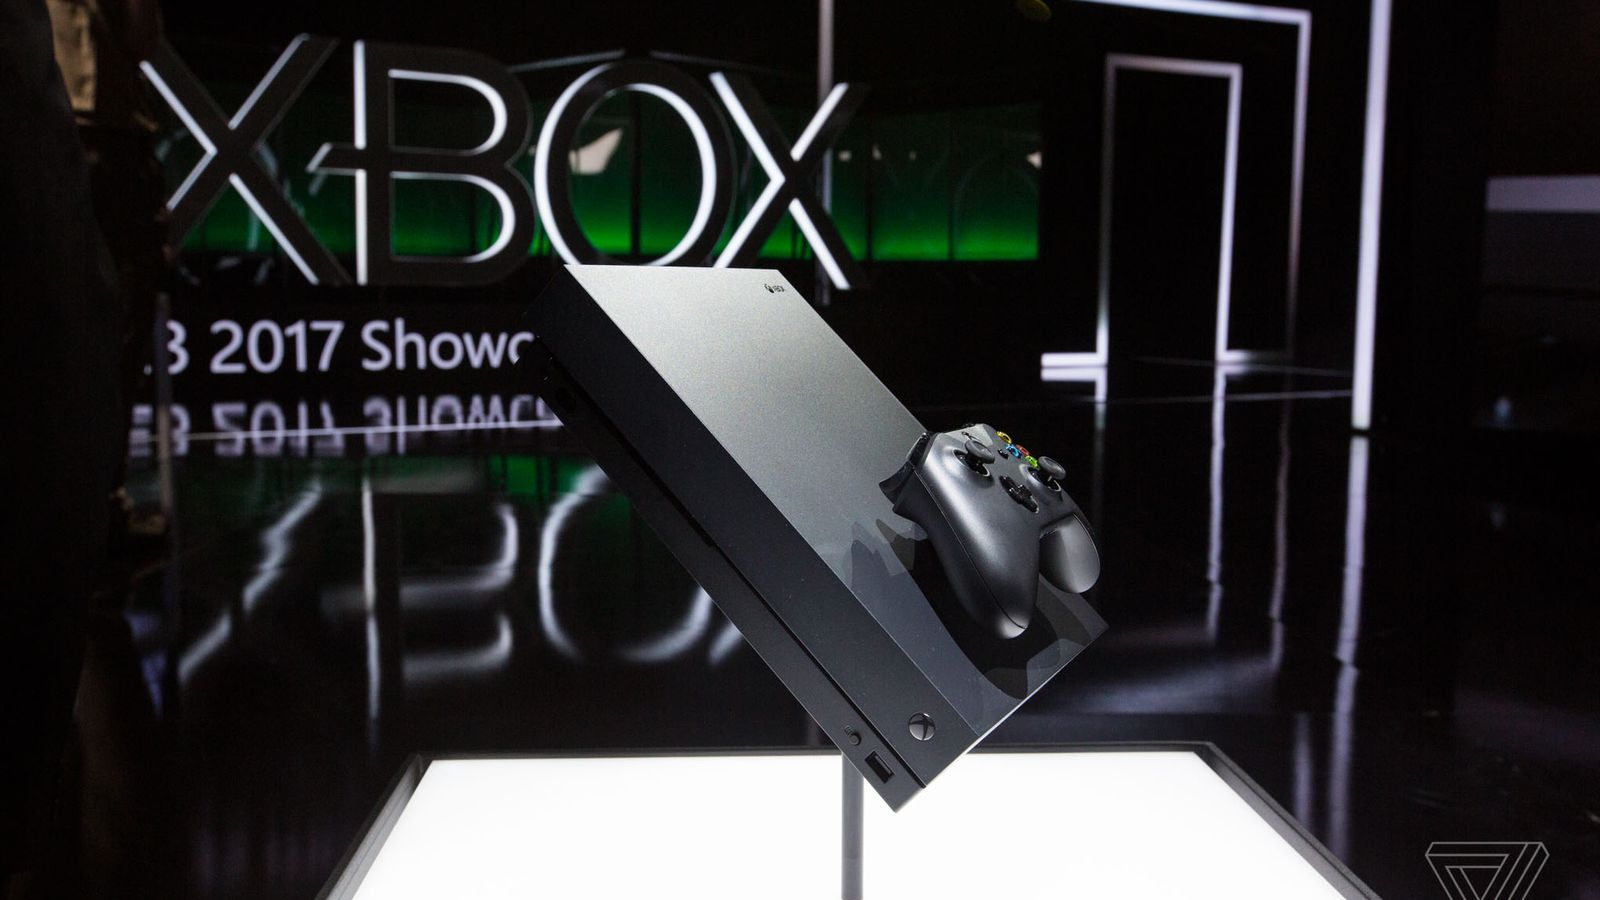 Why Microsoft didn't turn Xbox One X into a Windows 10